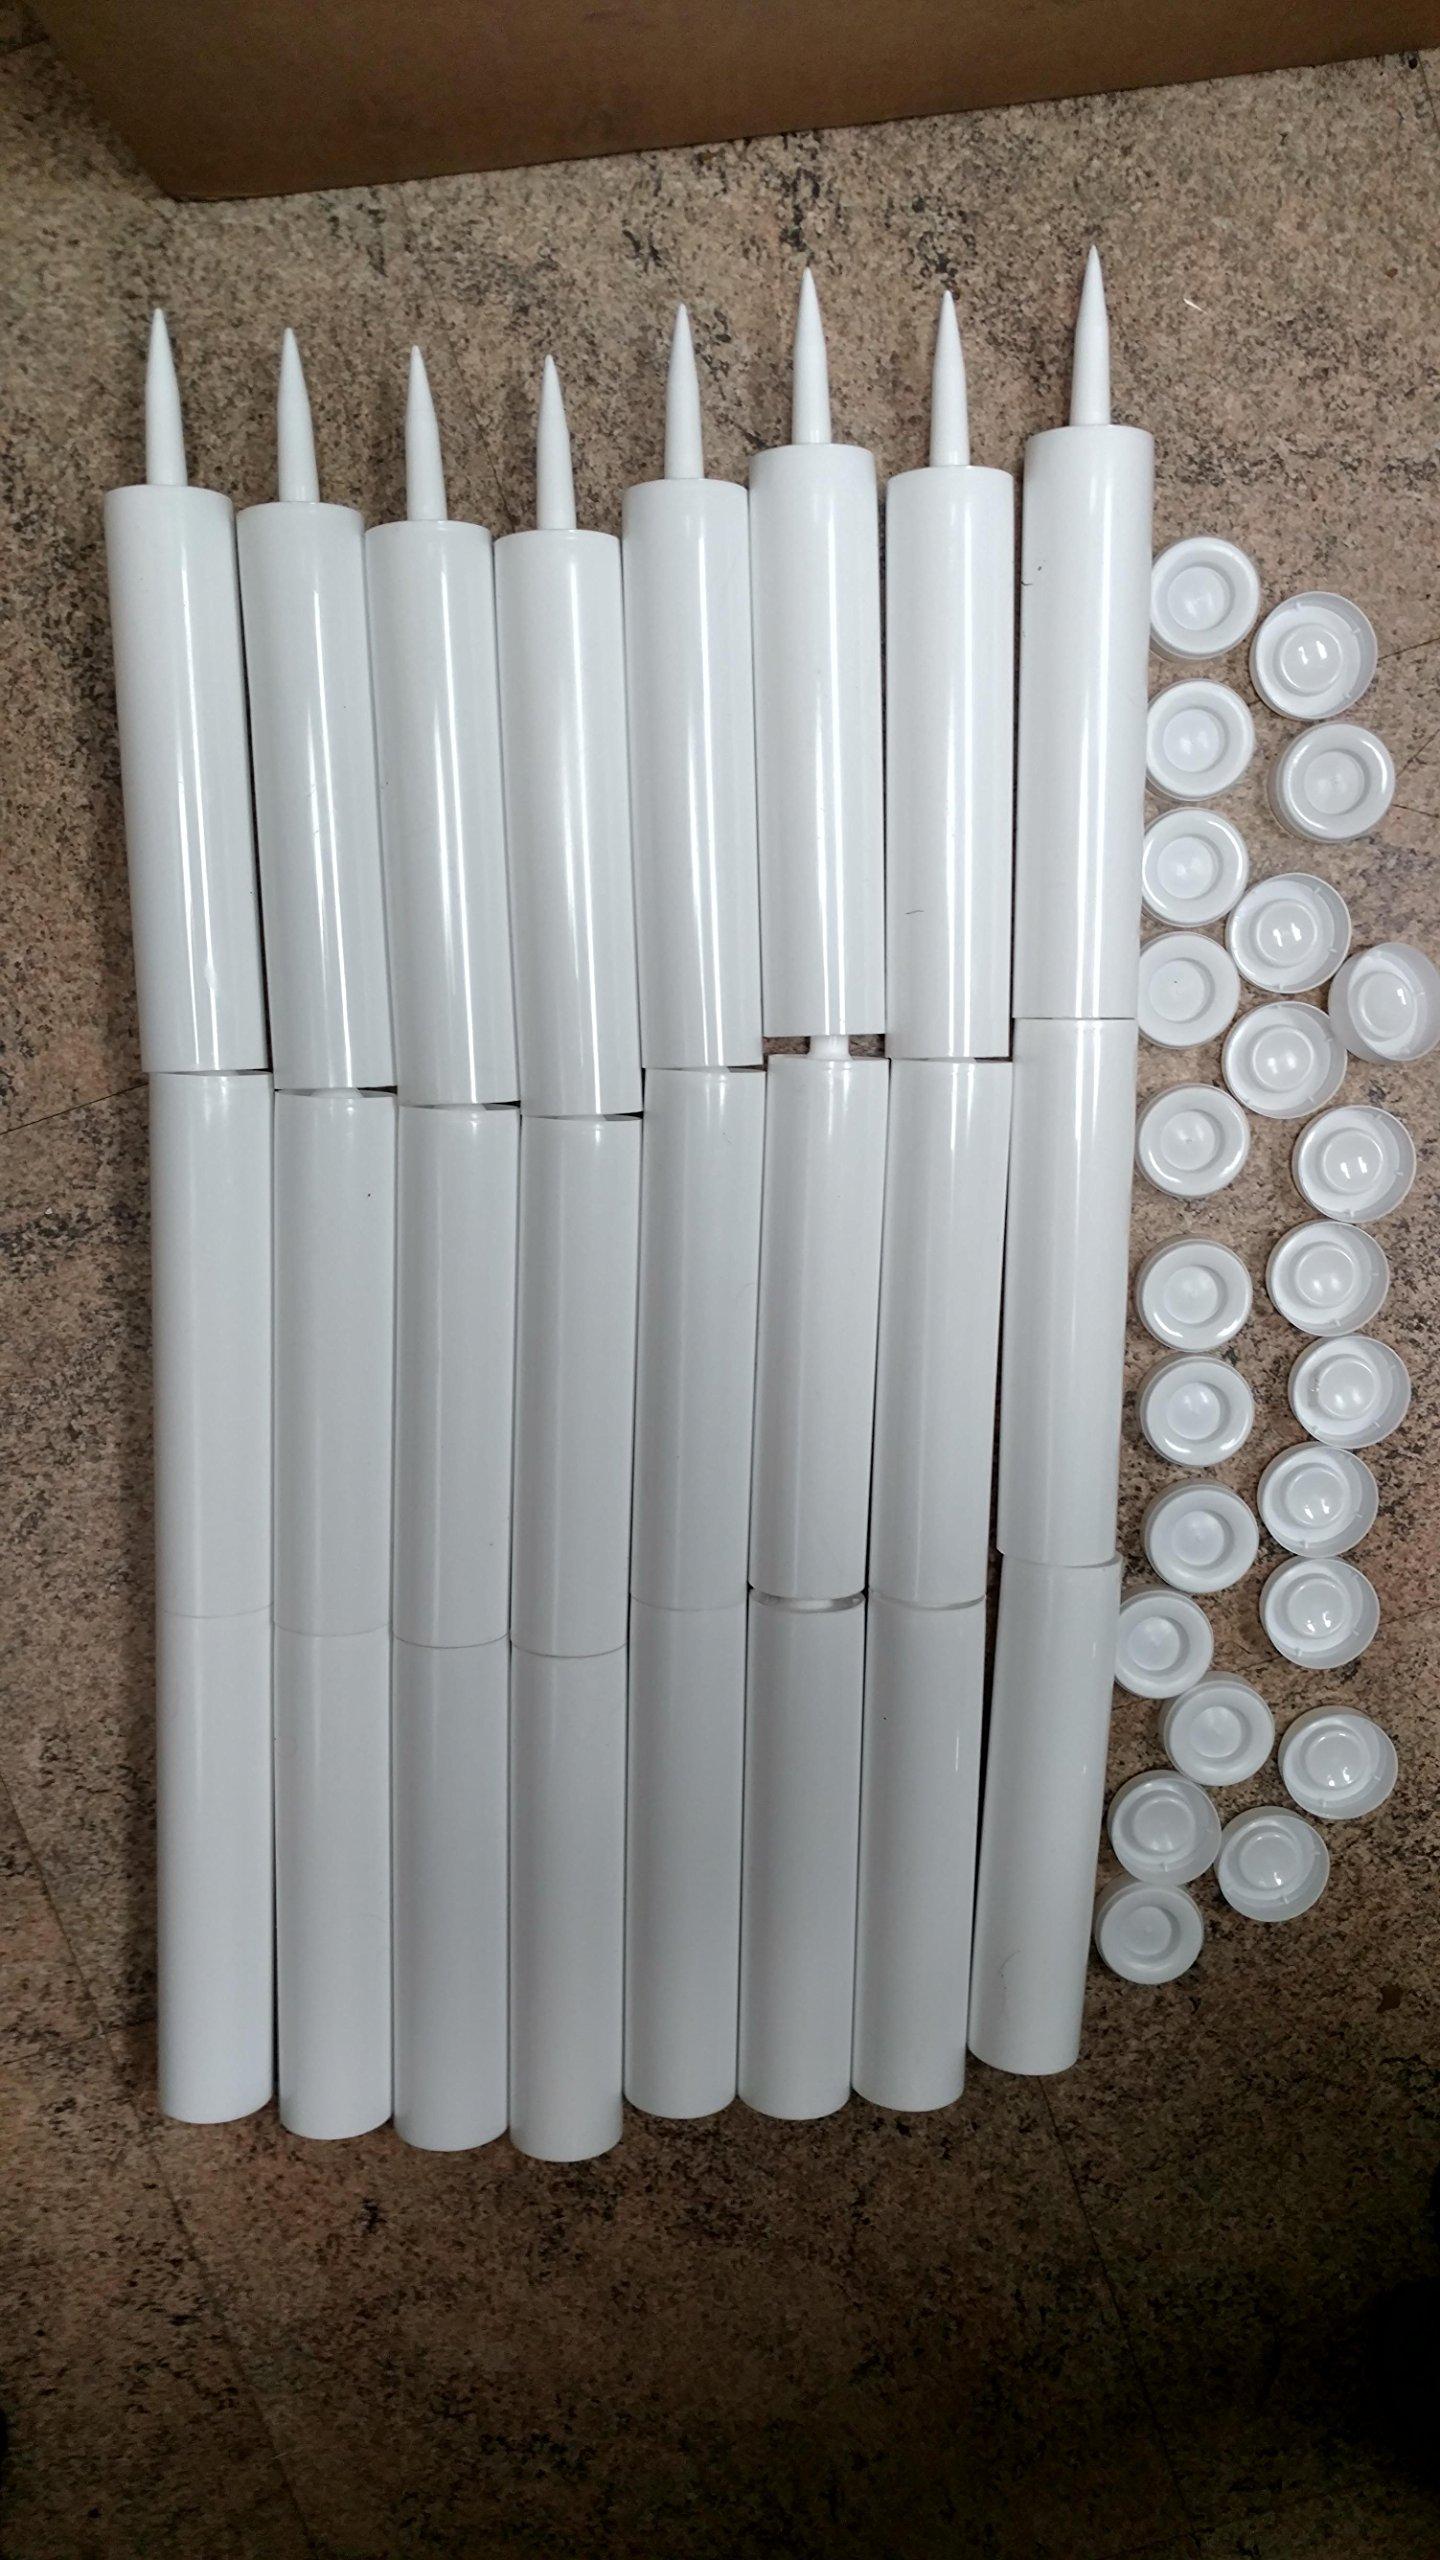 24 Empty Caulk Tube - Cartridge - Made in USA